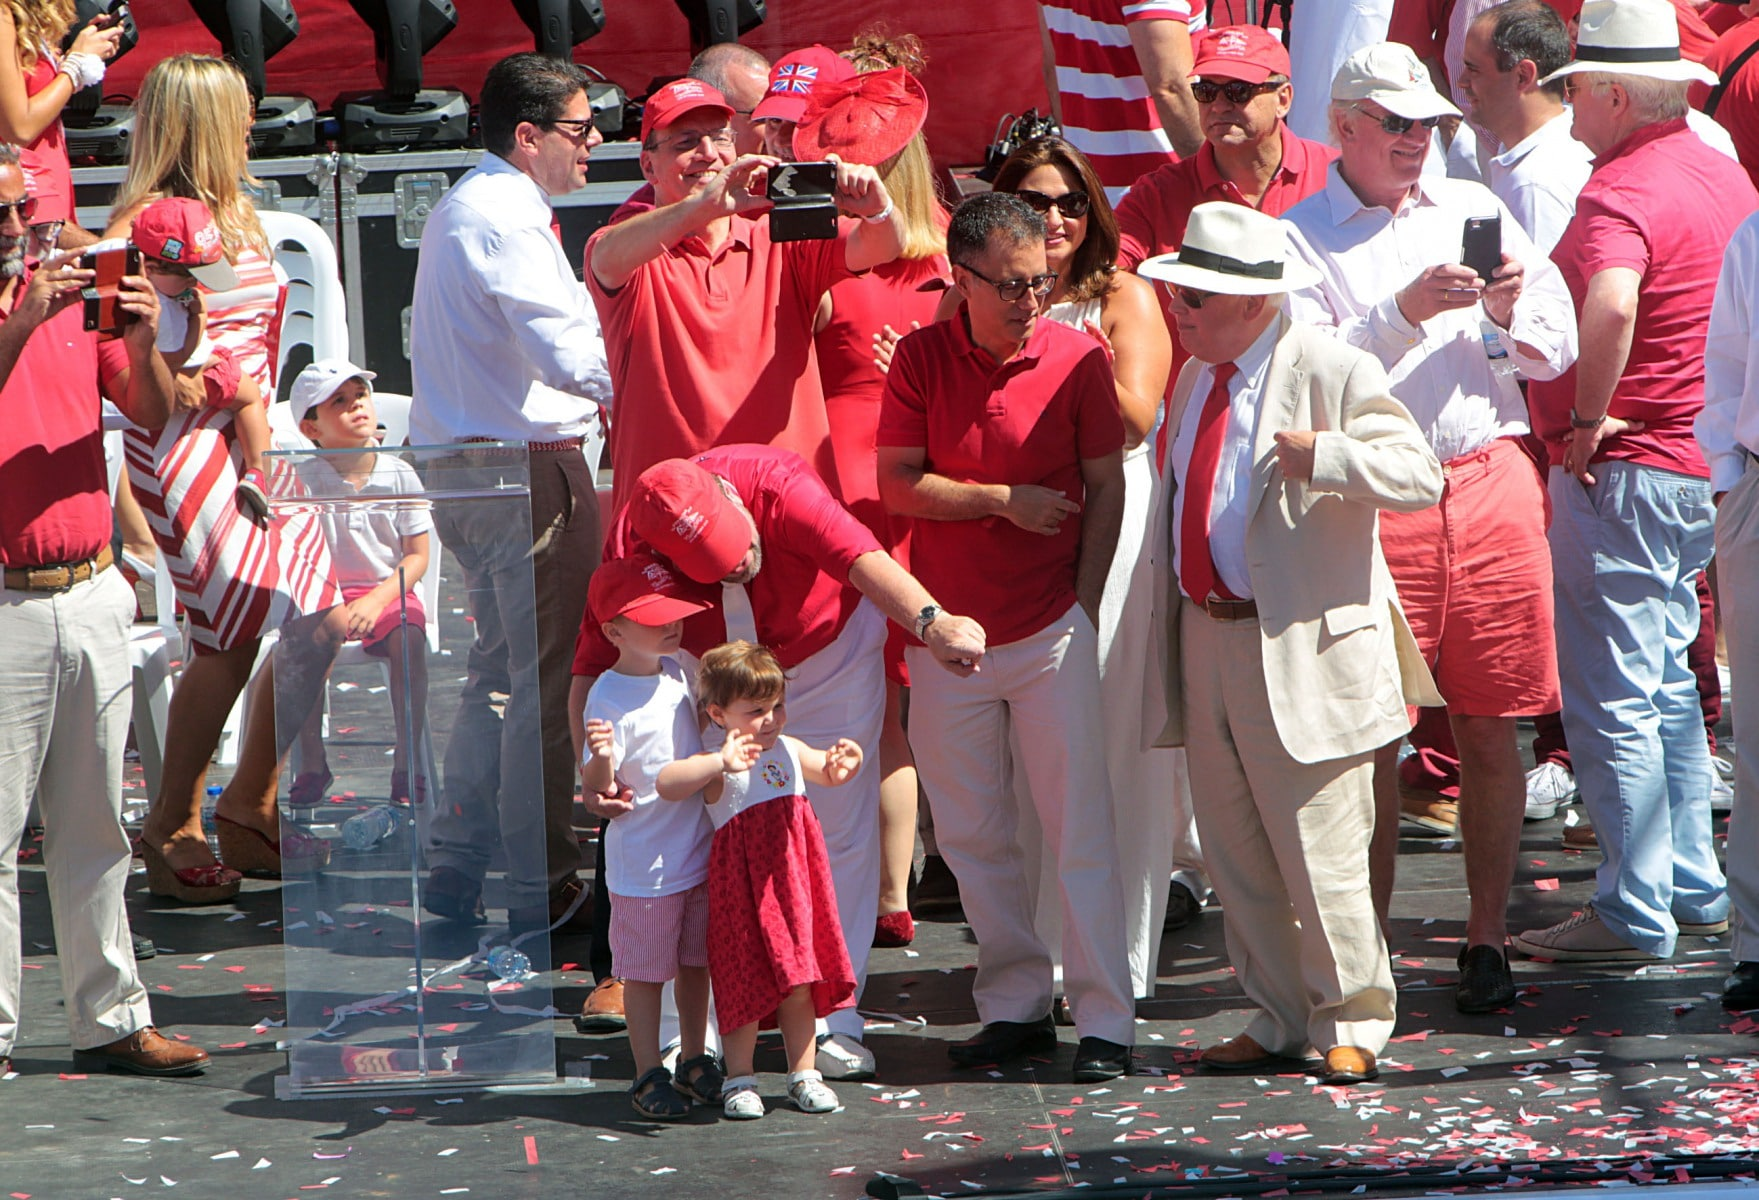 160910-national-day-gibraltar-2016-73_29314644140_o